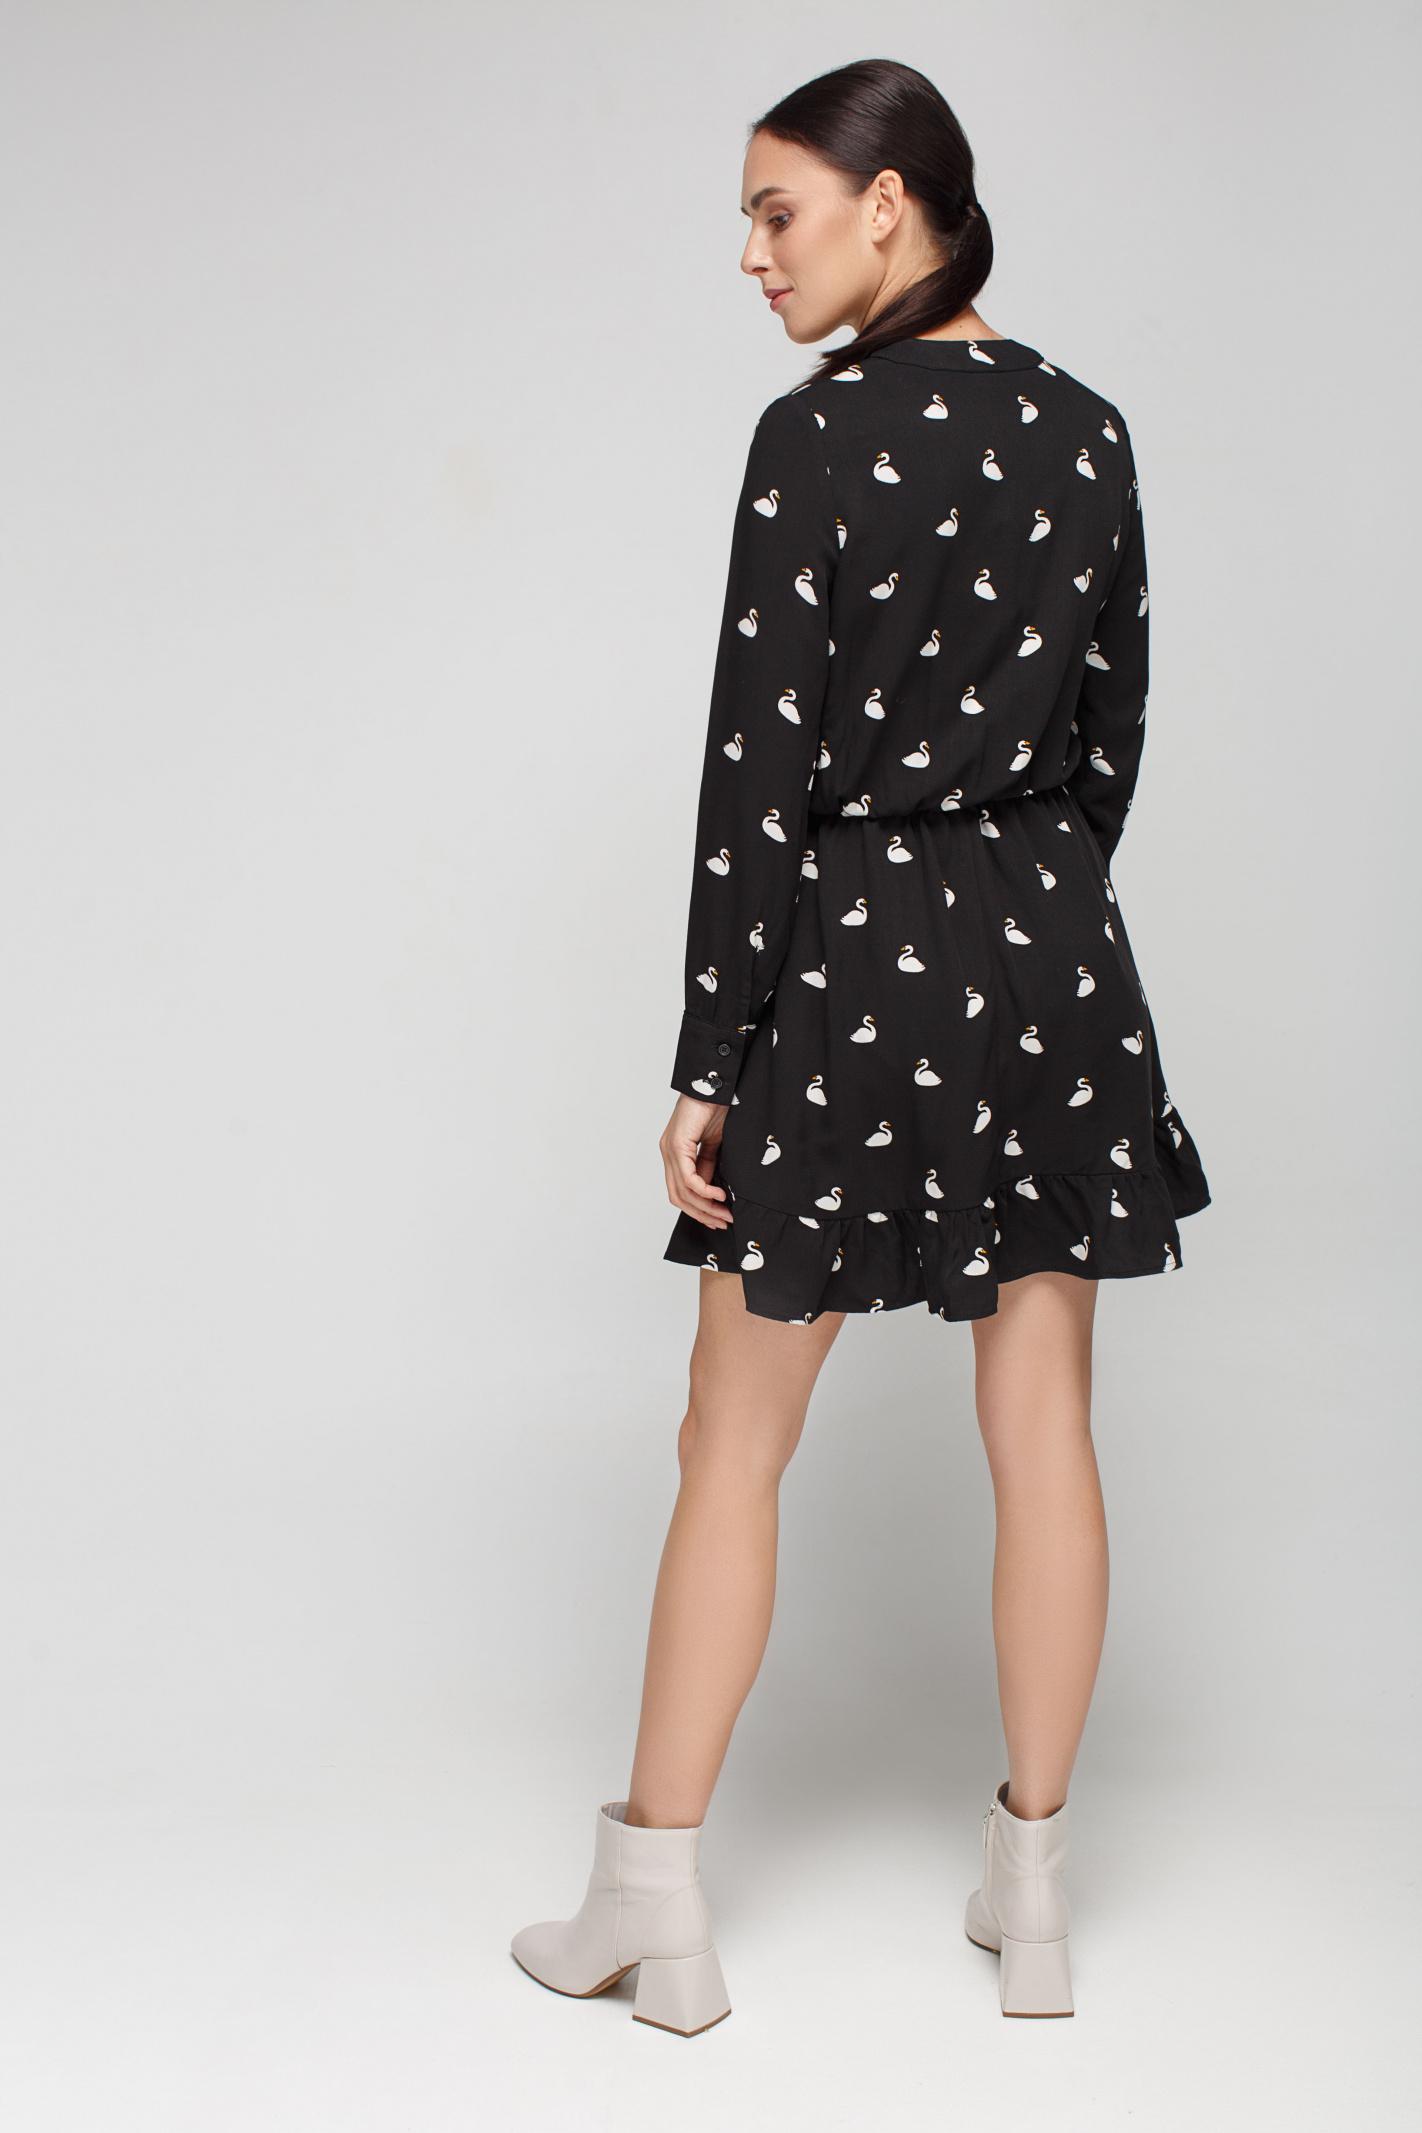 Платье женские MustHave модель 7547 , 2017